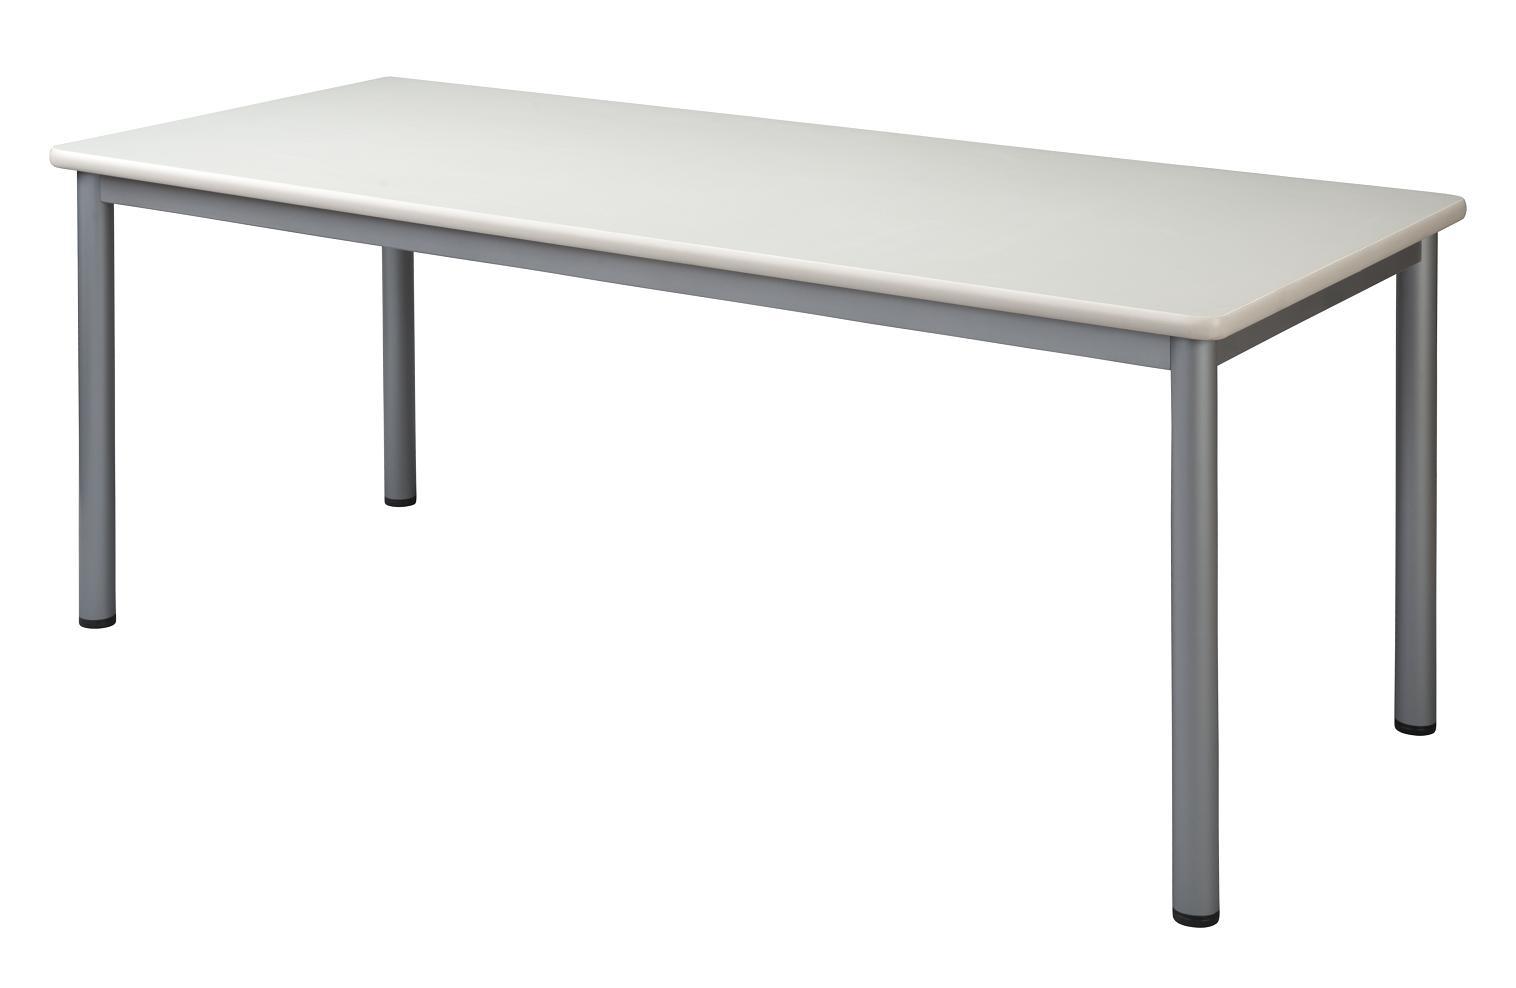 HITECHWOOD【ハイテクウッド】 ミーティングテーブル TL1890-NW ホワイト W1800xD900xH700mm